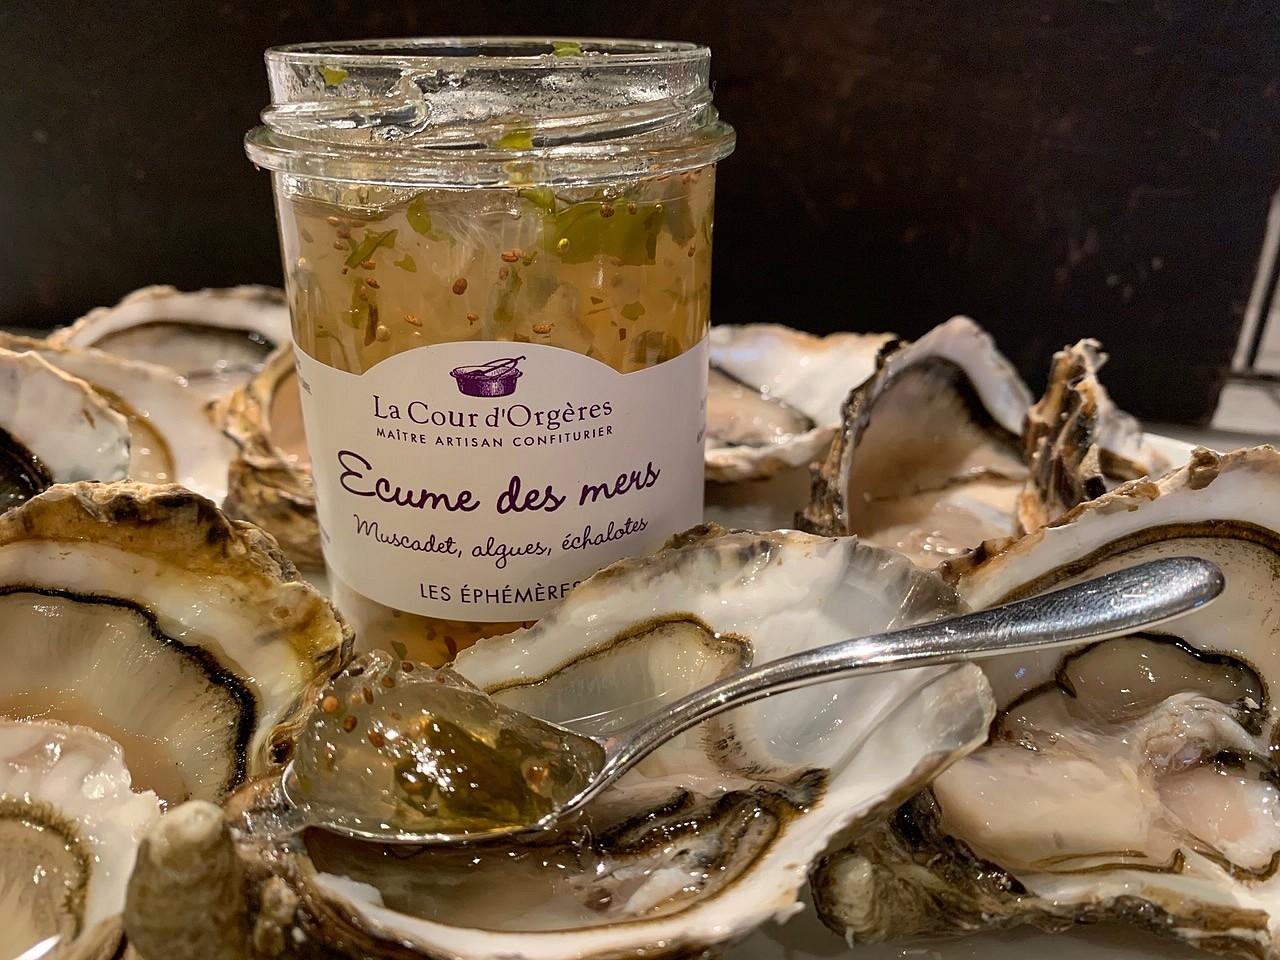 séance de dégustation ©TB/laradiodugout.fr